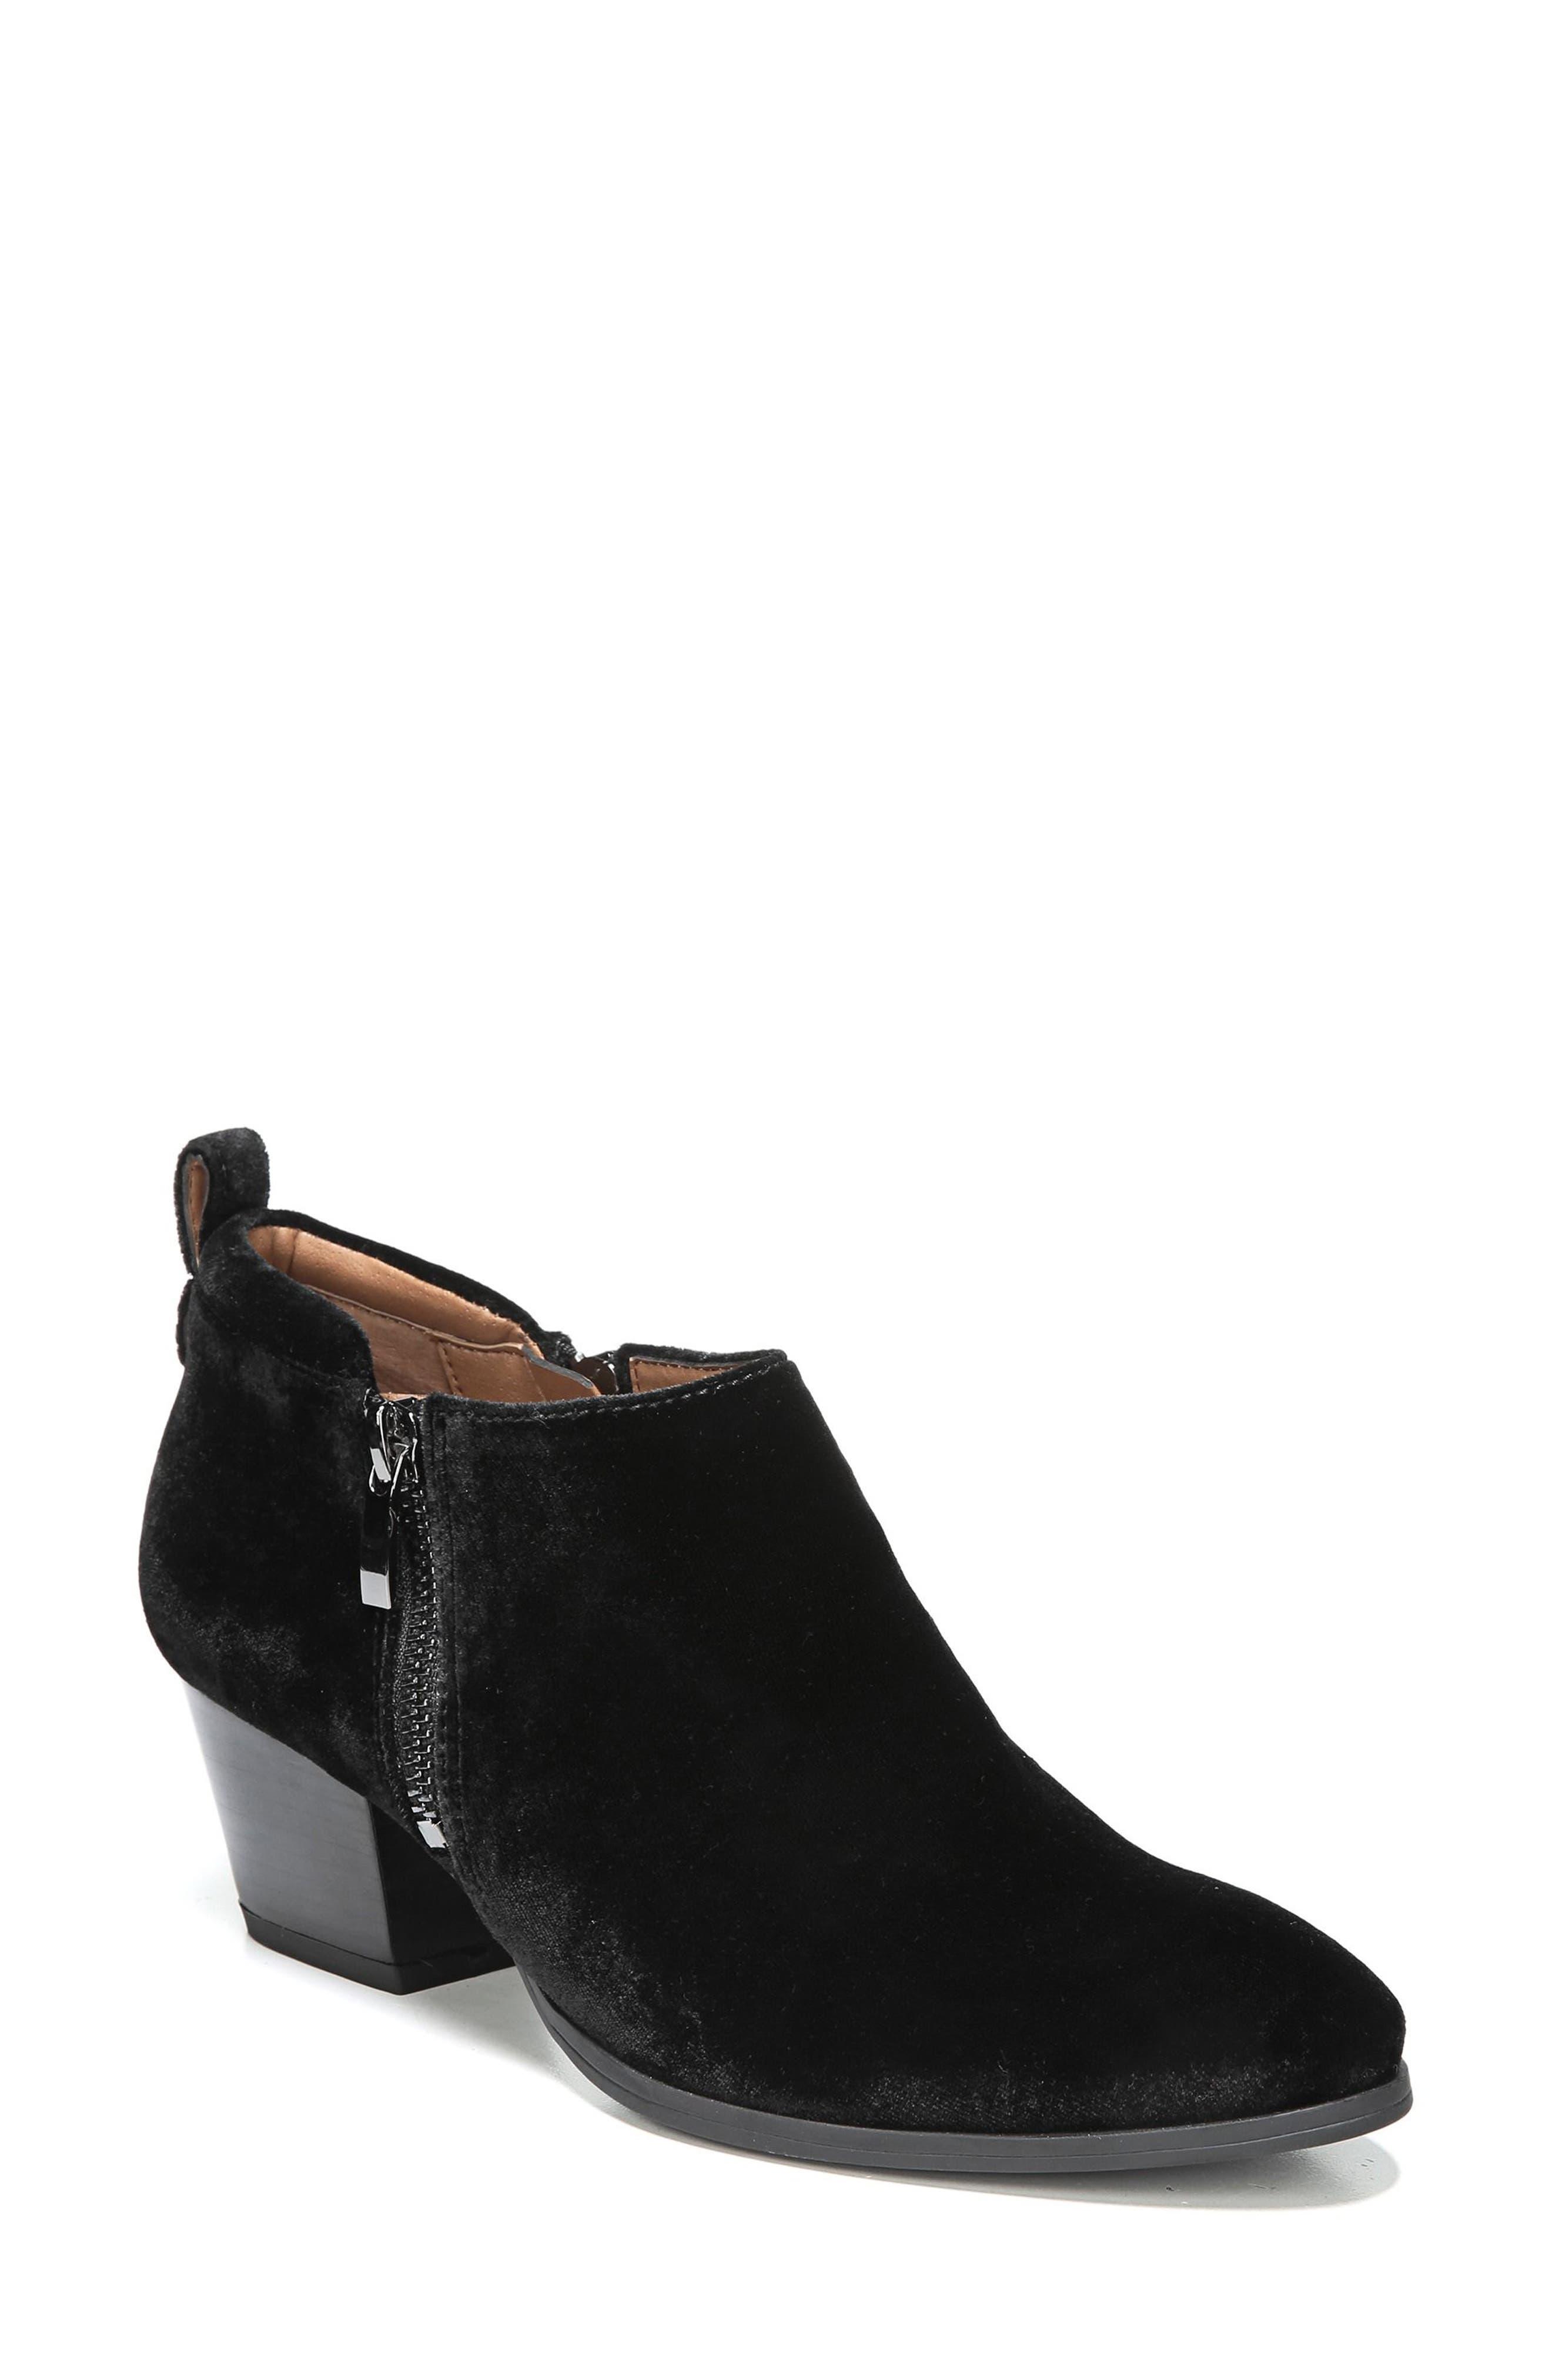 Alternate Image 1 Selected - SARTO by Franco Sarto 'Granite' Block Heel Bootie (Women)